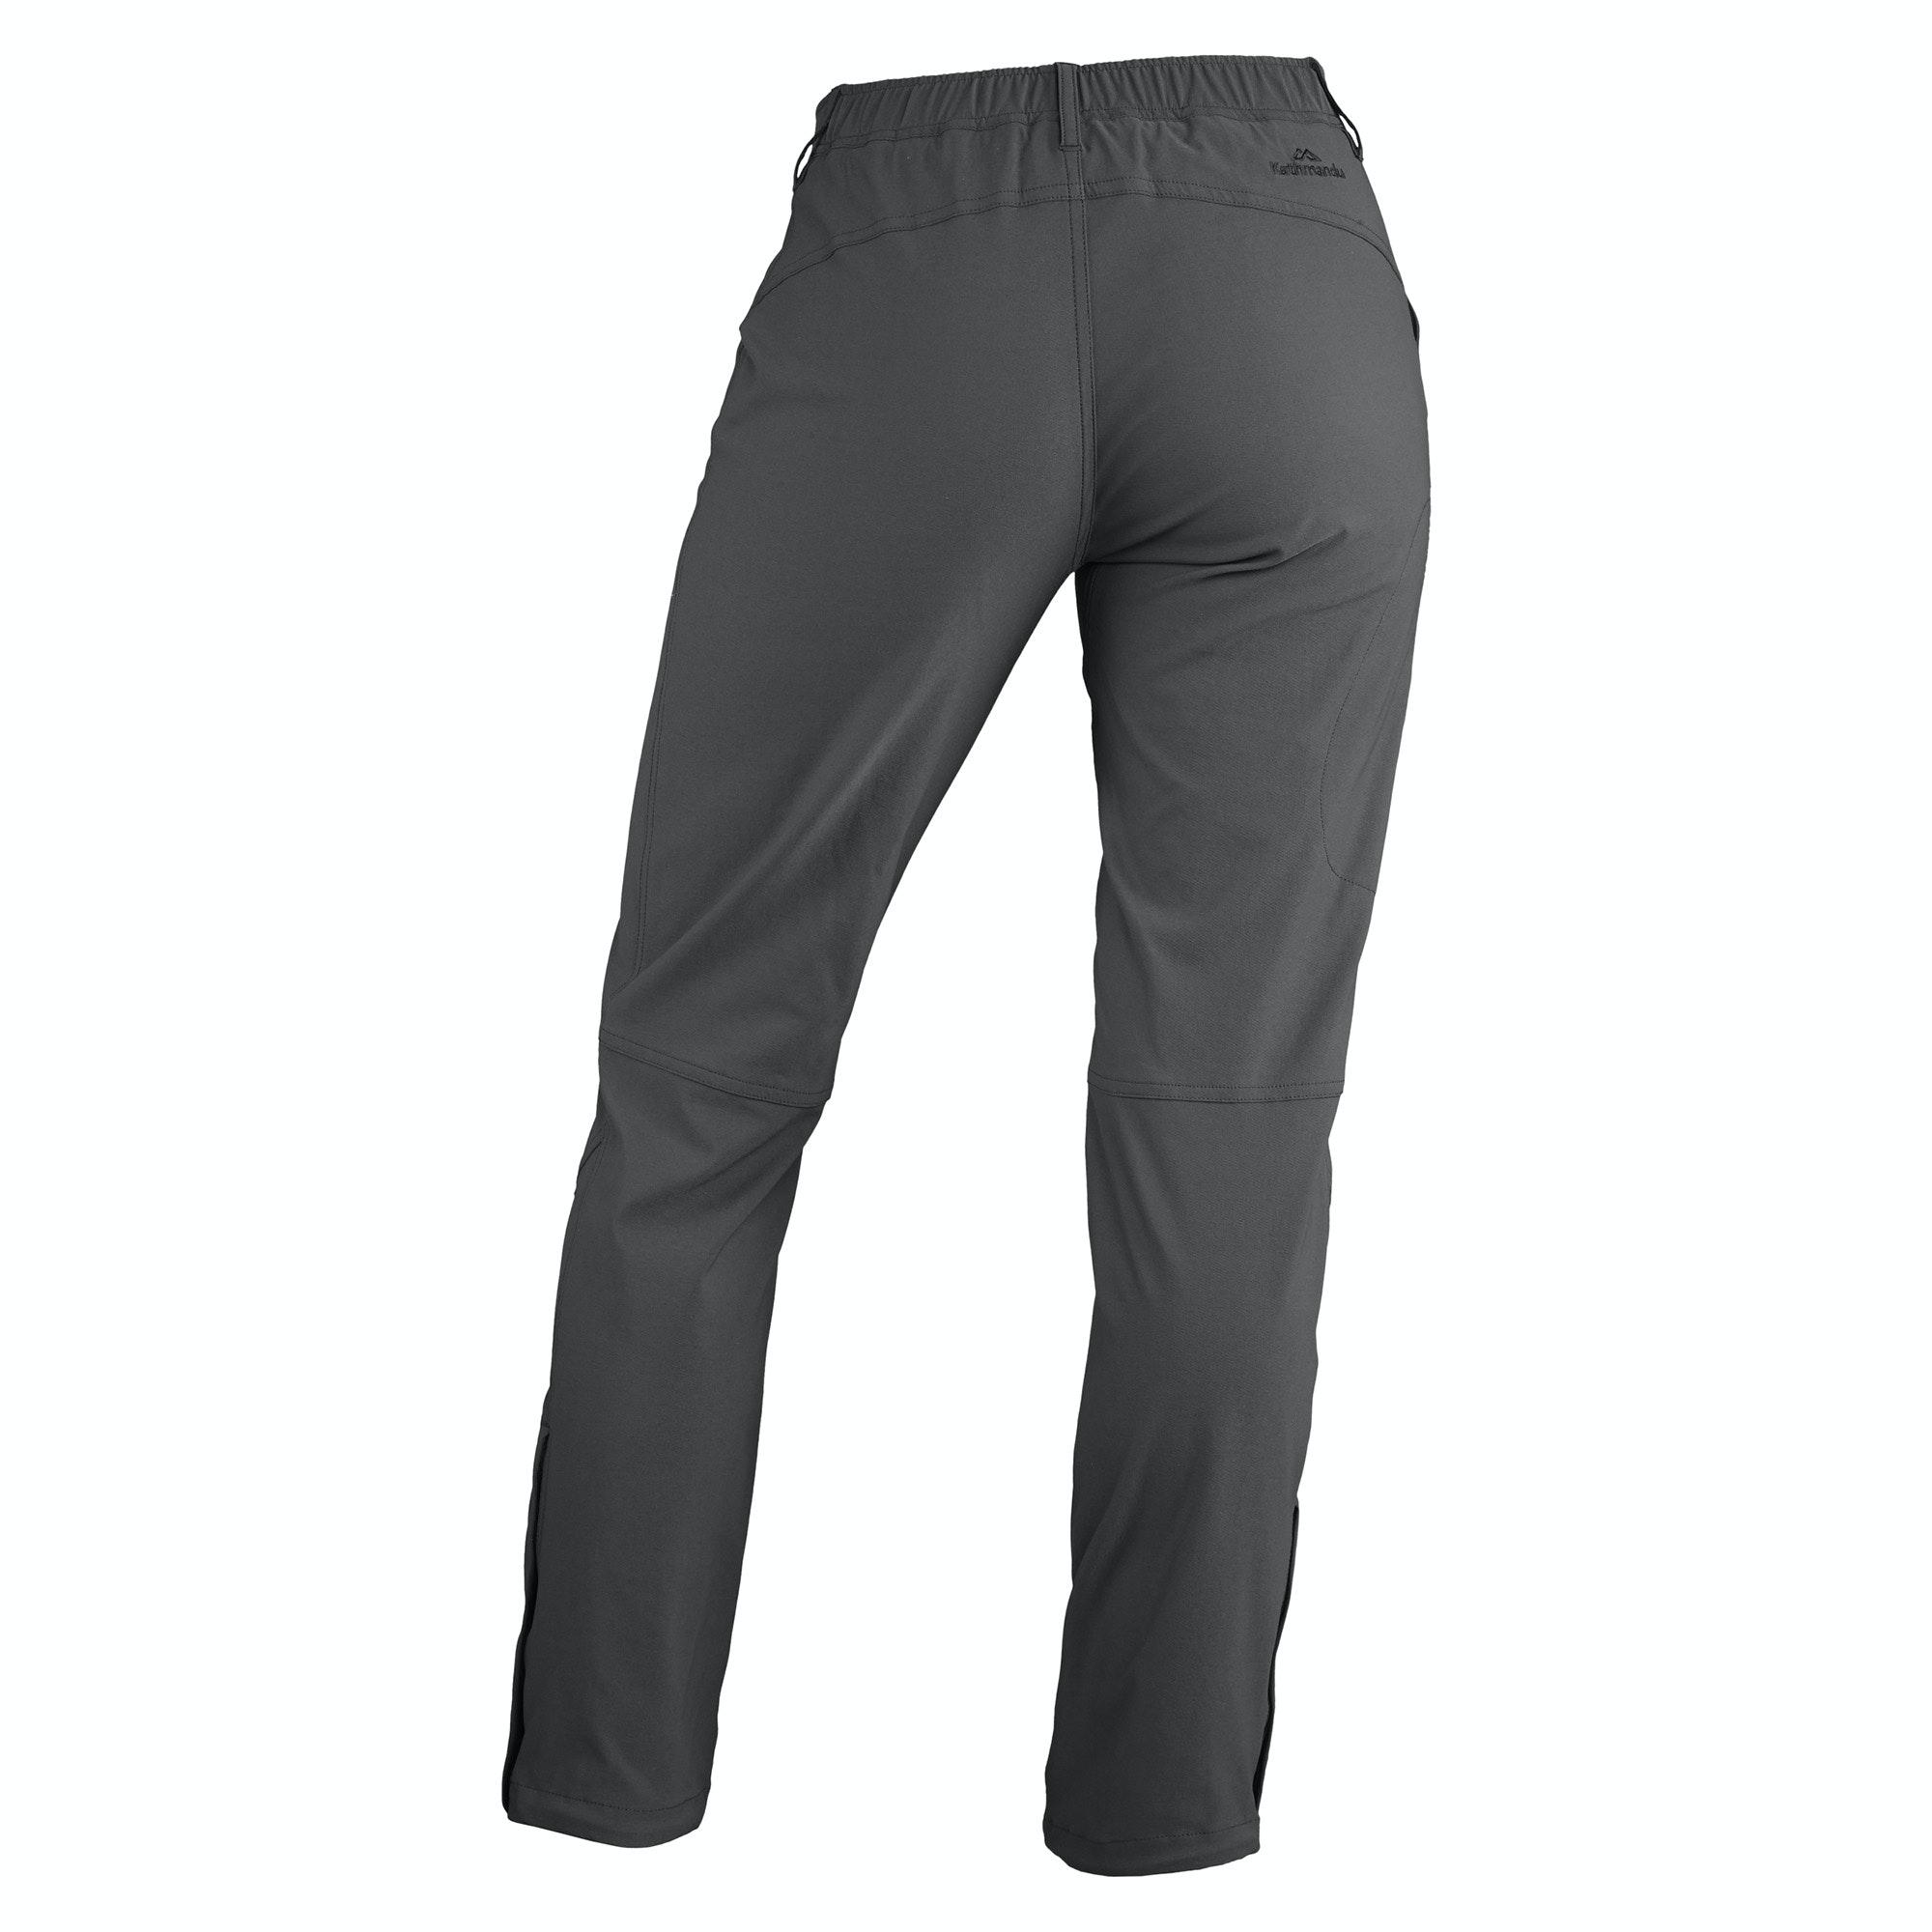 NEW-Kathmandu-Eris-Women-039-s-Softshell-Hiking-Pants-Trousers-v2-Zip-Hem-Over-Boots thumbnail 5